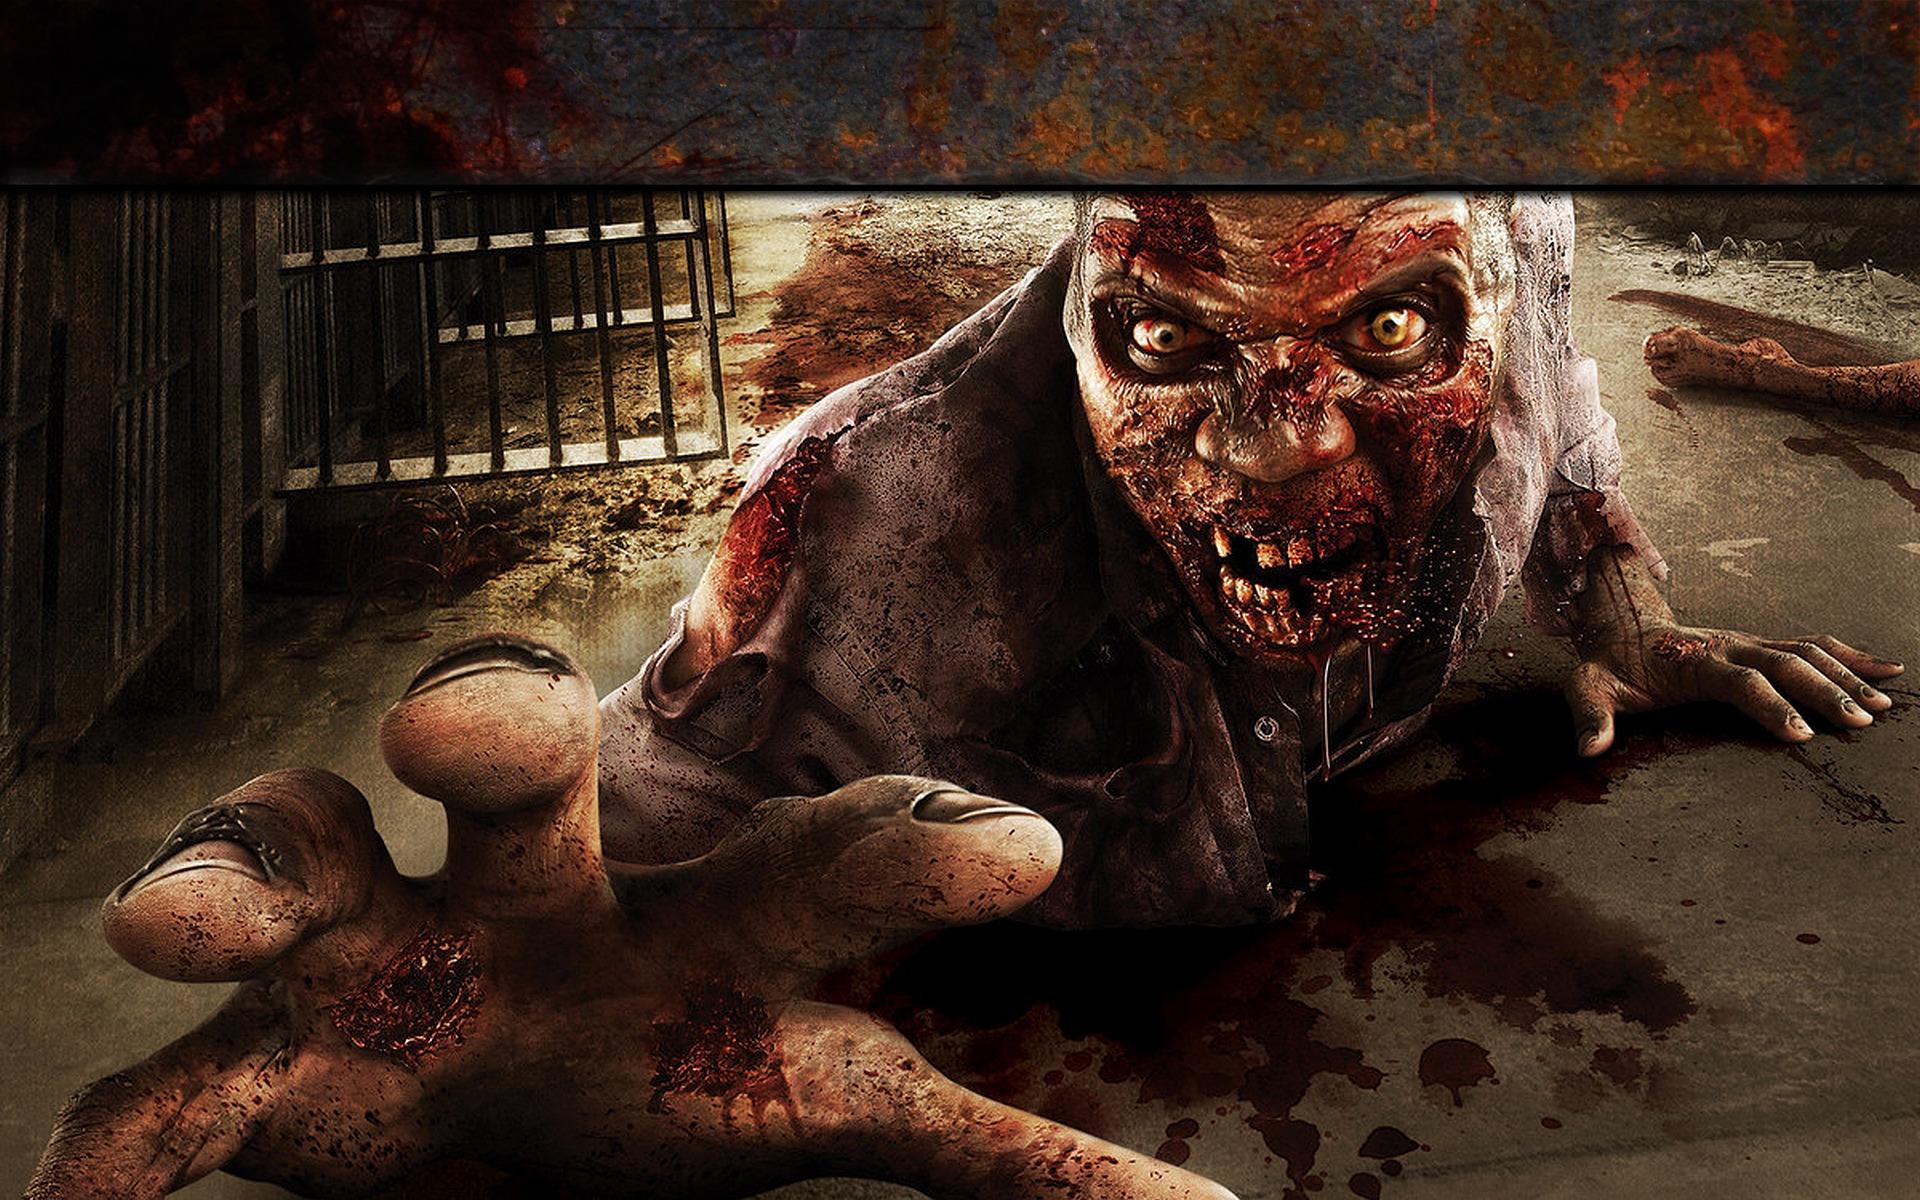 fond d'ecran zombie